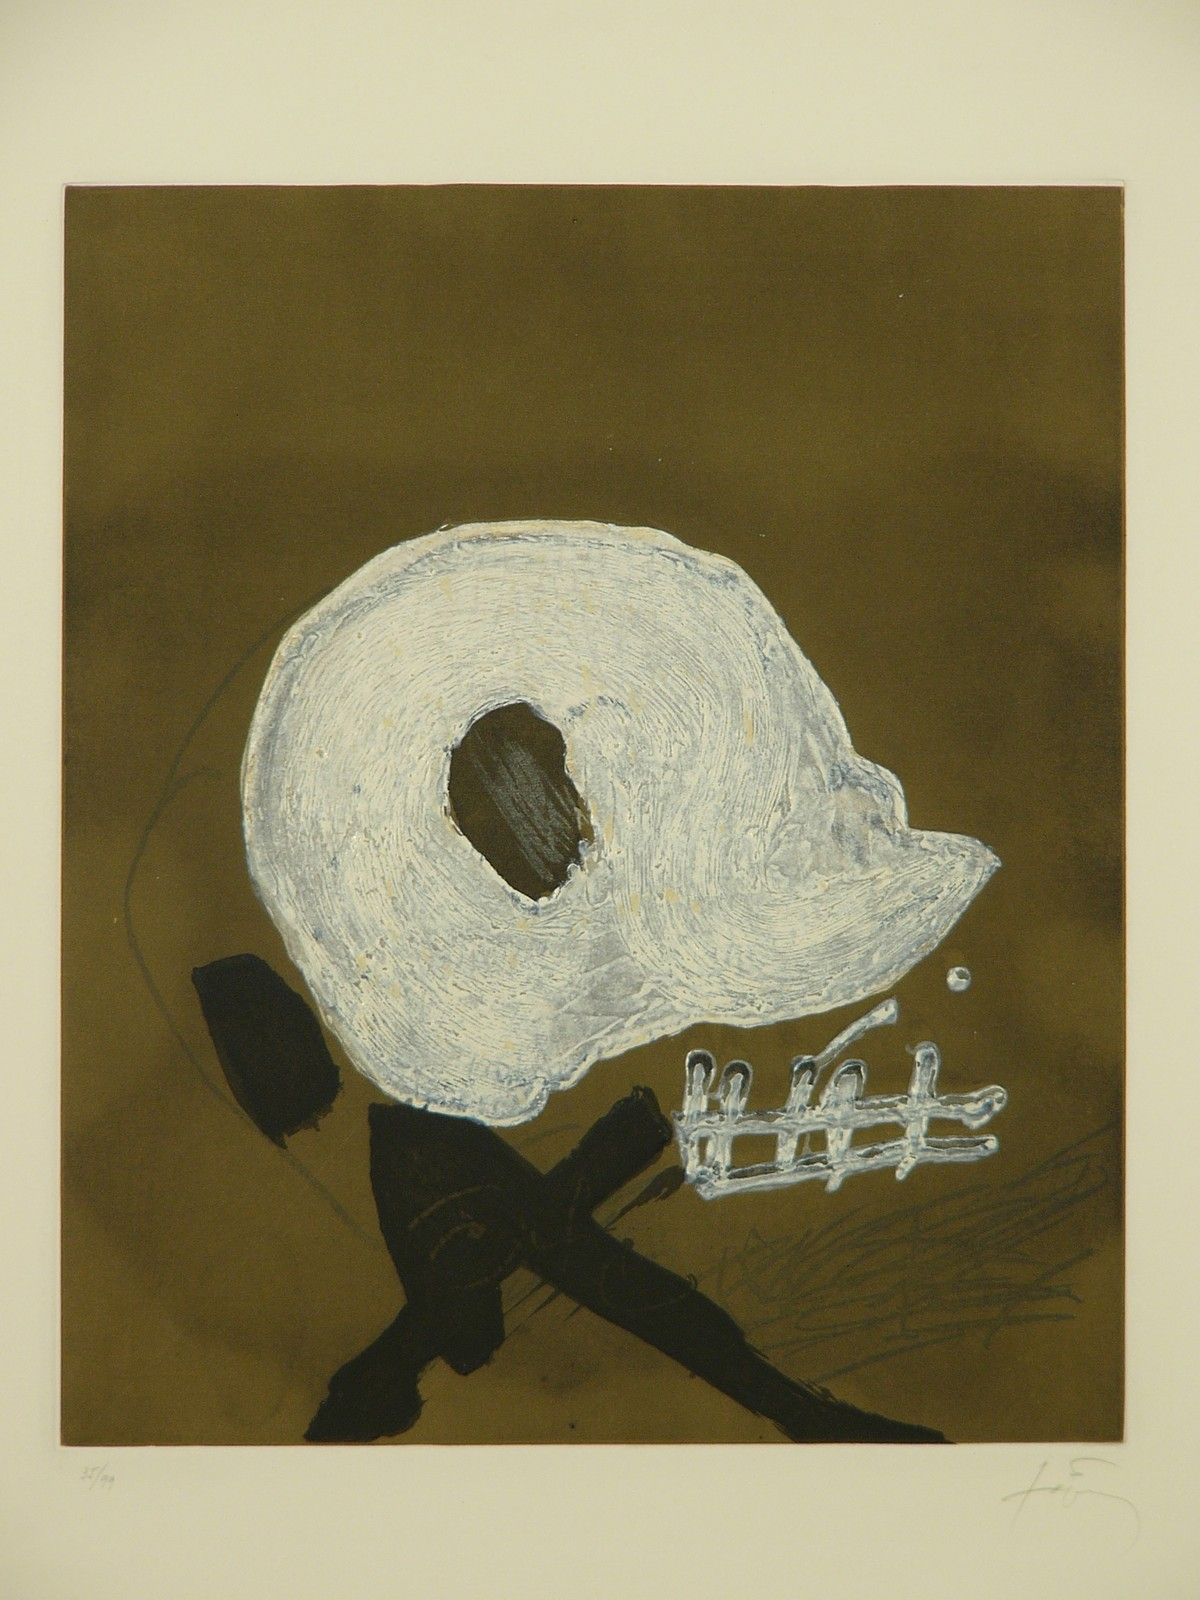 1982, etching, 35/99, 42 x 49 cm